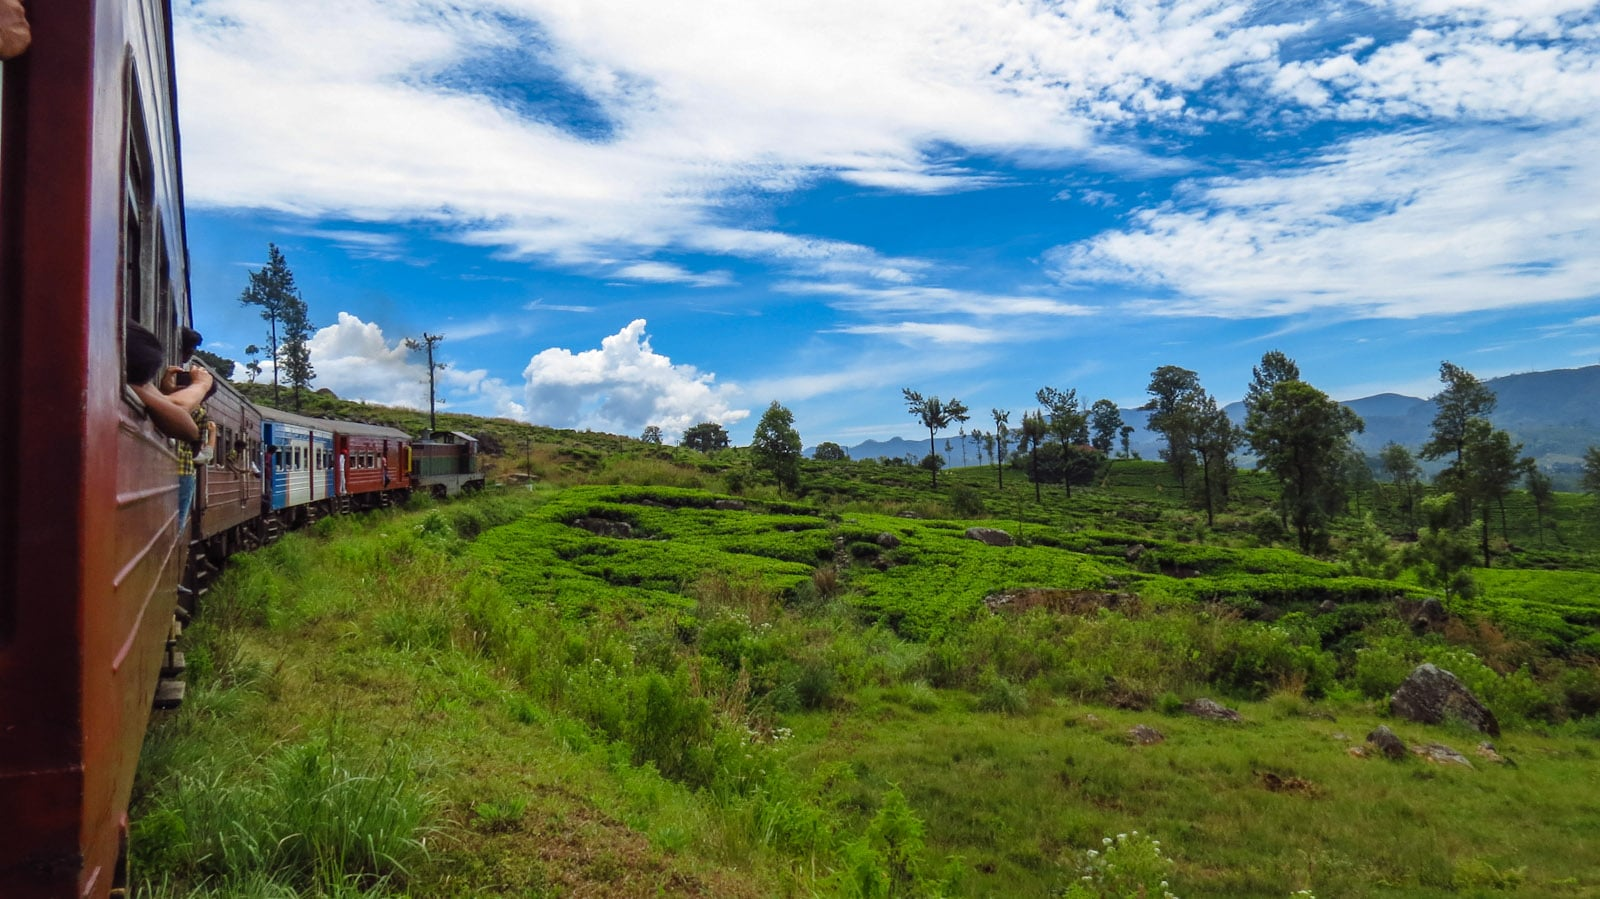 Asian Highland Destination Article Image